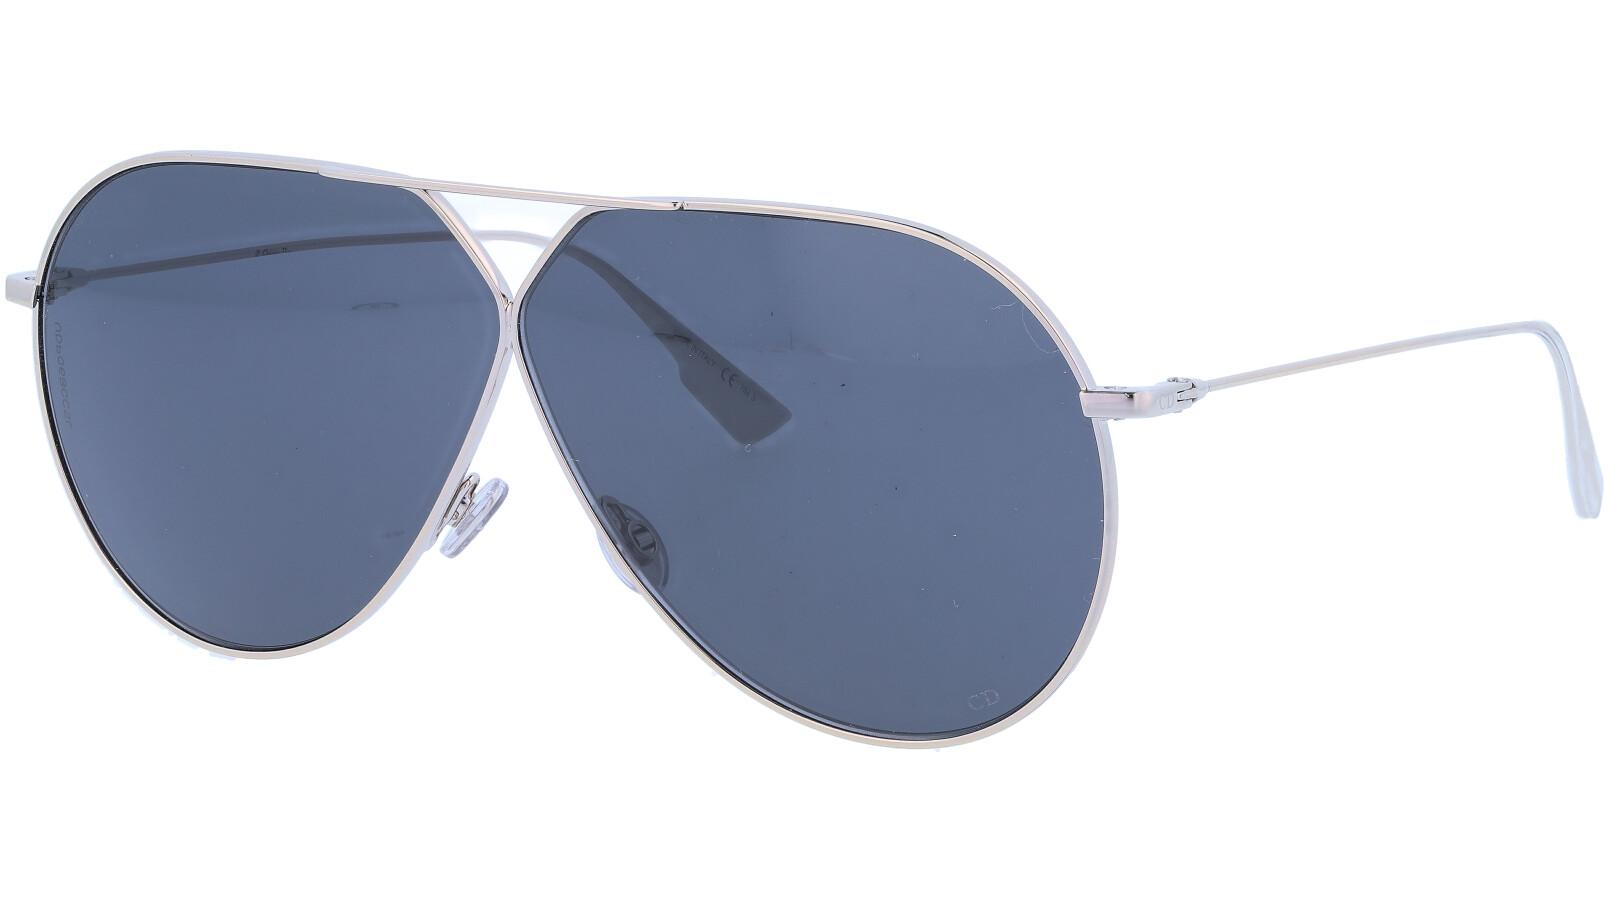 DIOR DIORSTELLAIRE3 3YGIR 65 LIGHT Sunglasses